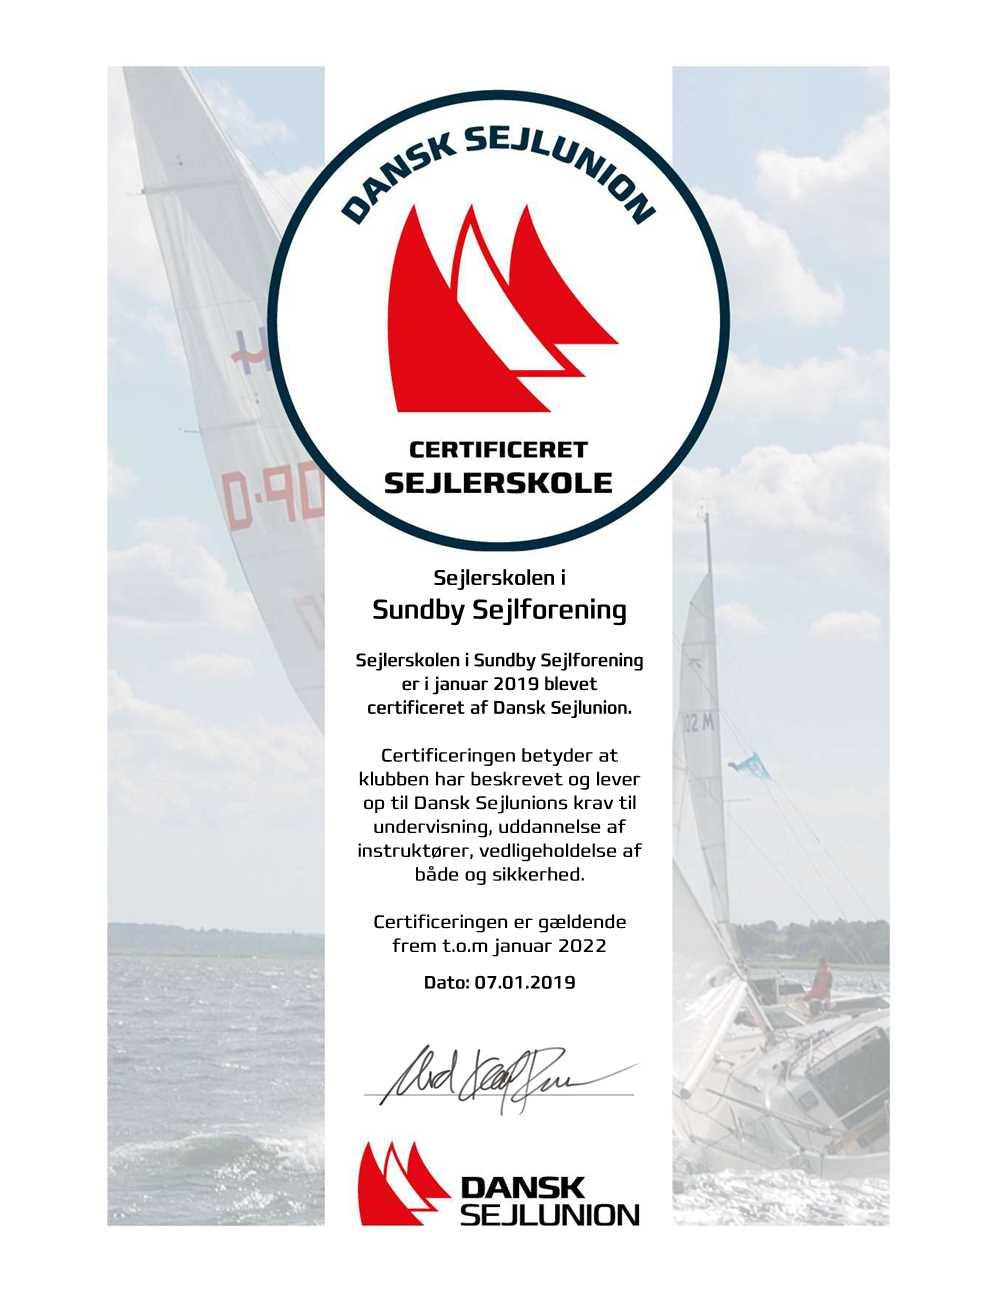 Certificeringscertifikat for Sundby Sejlforenings Sejlerskole januar 2019